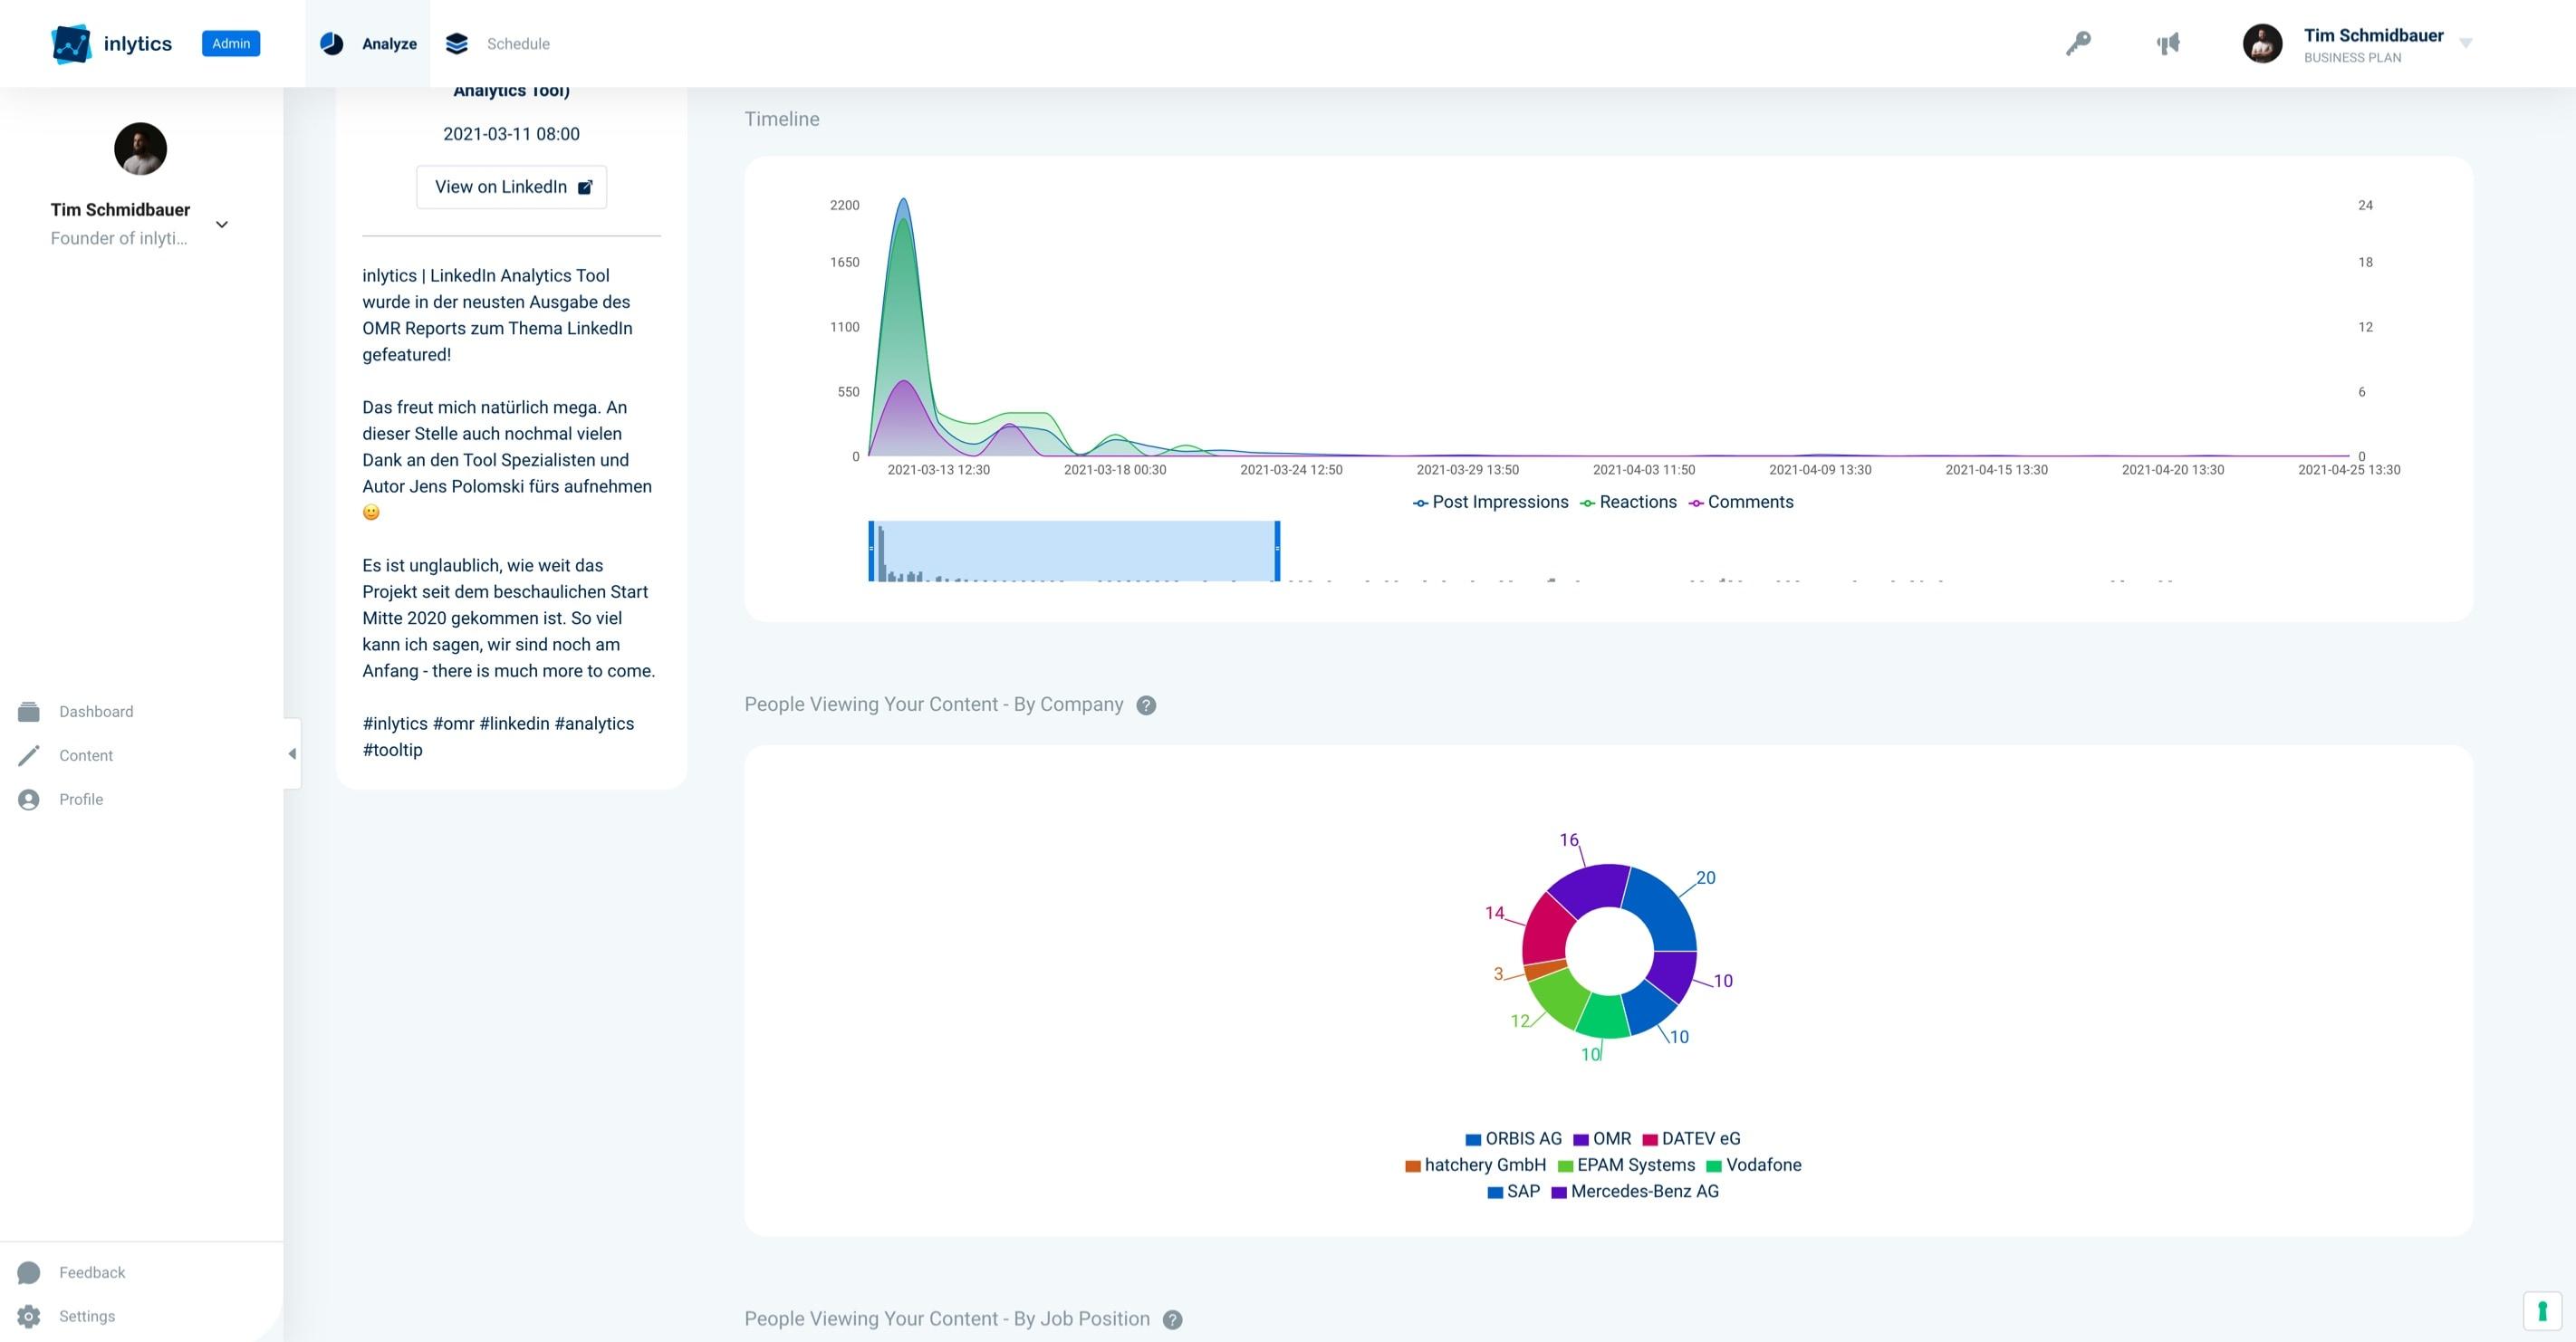 inlytics LinkedIn Analytics Tool - detailed audience insights